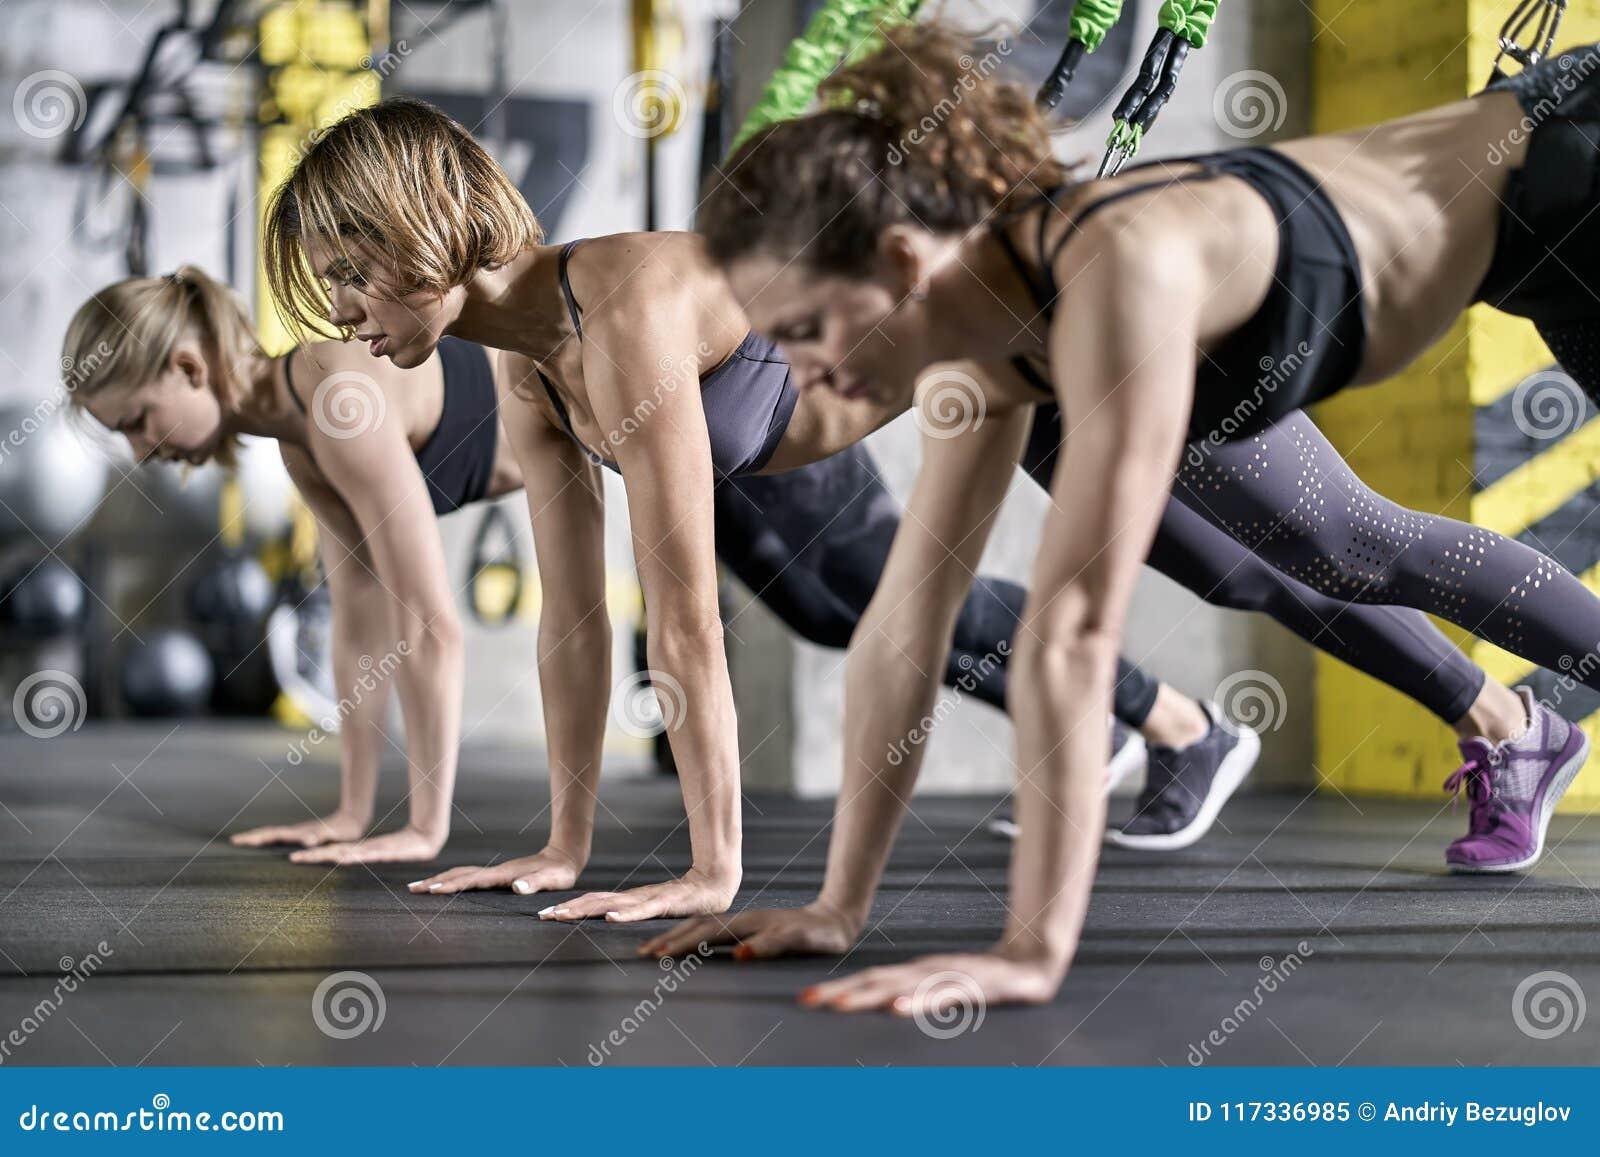 Sportive Girls Training In Gym Stock